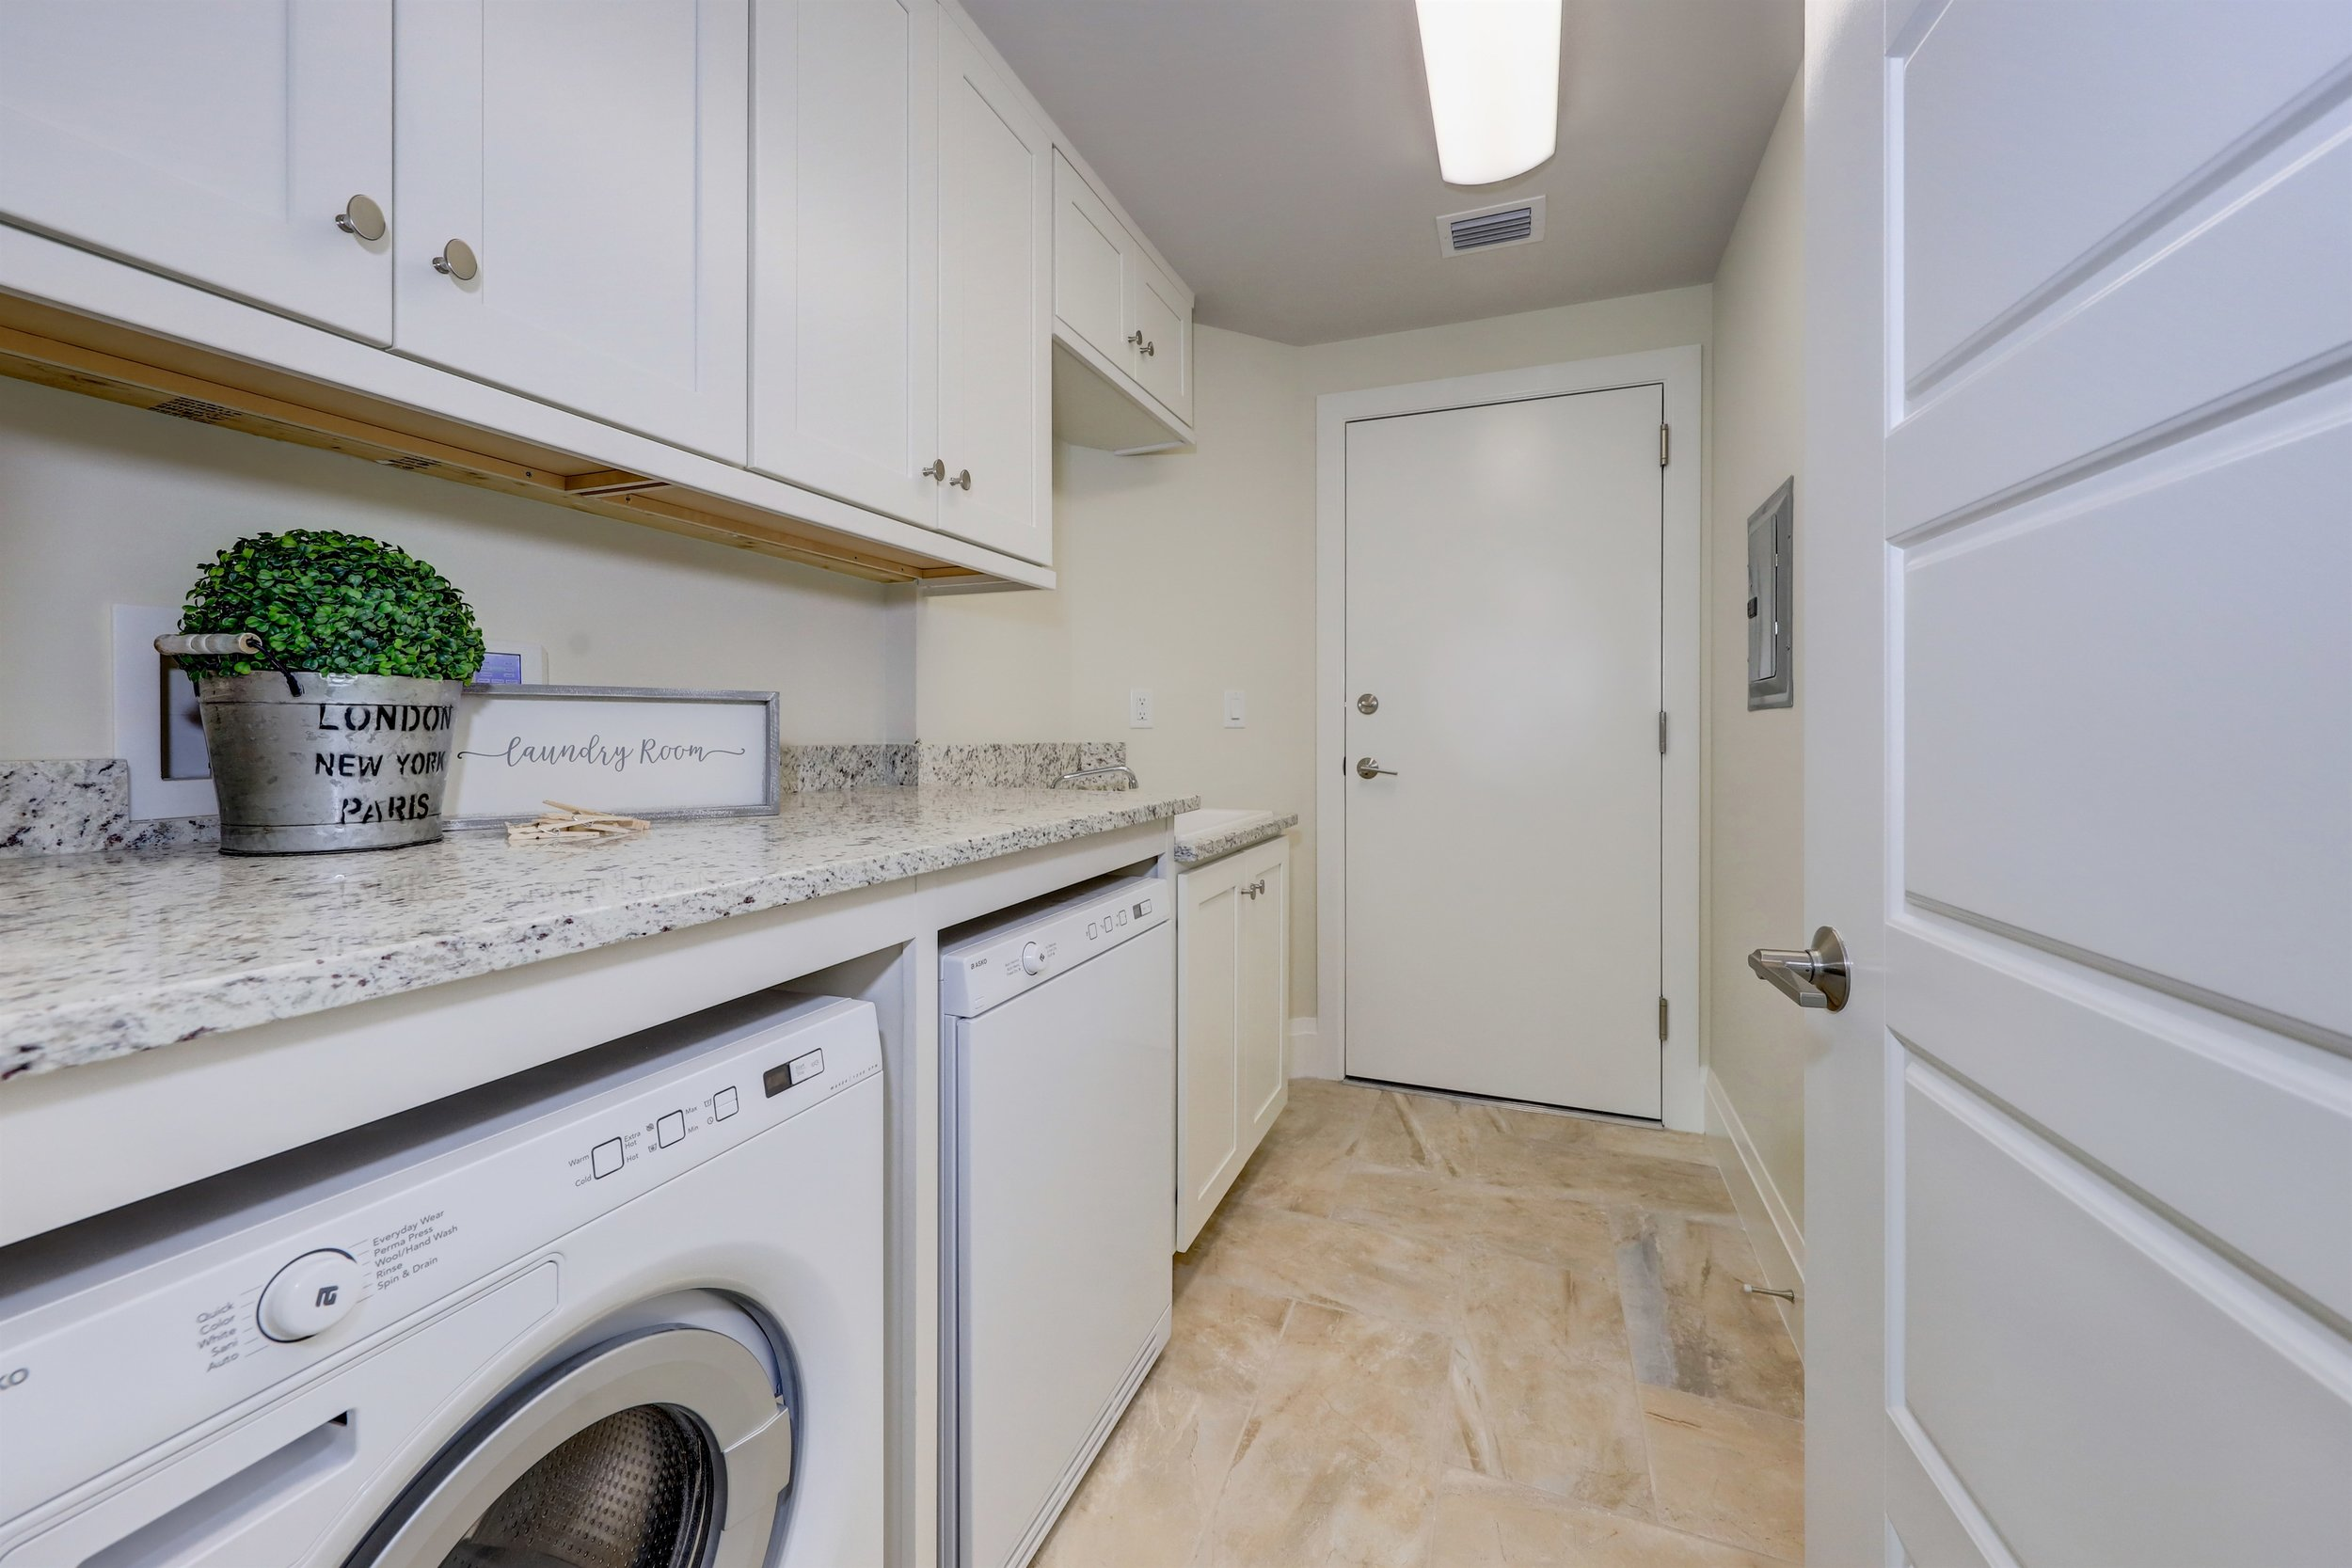 033_Laundry Room.jpg